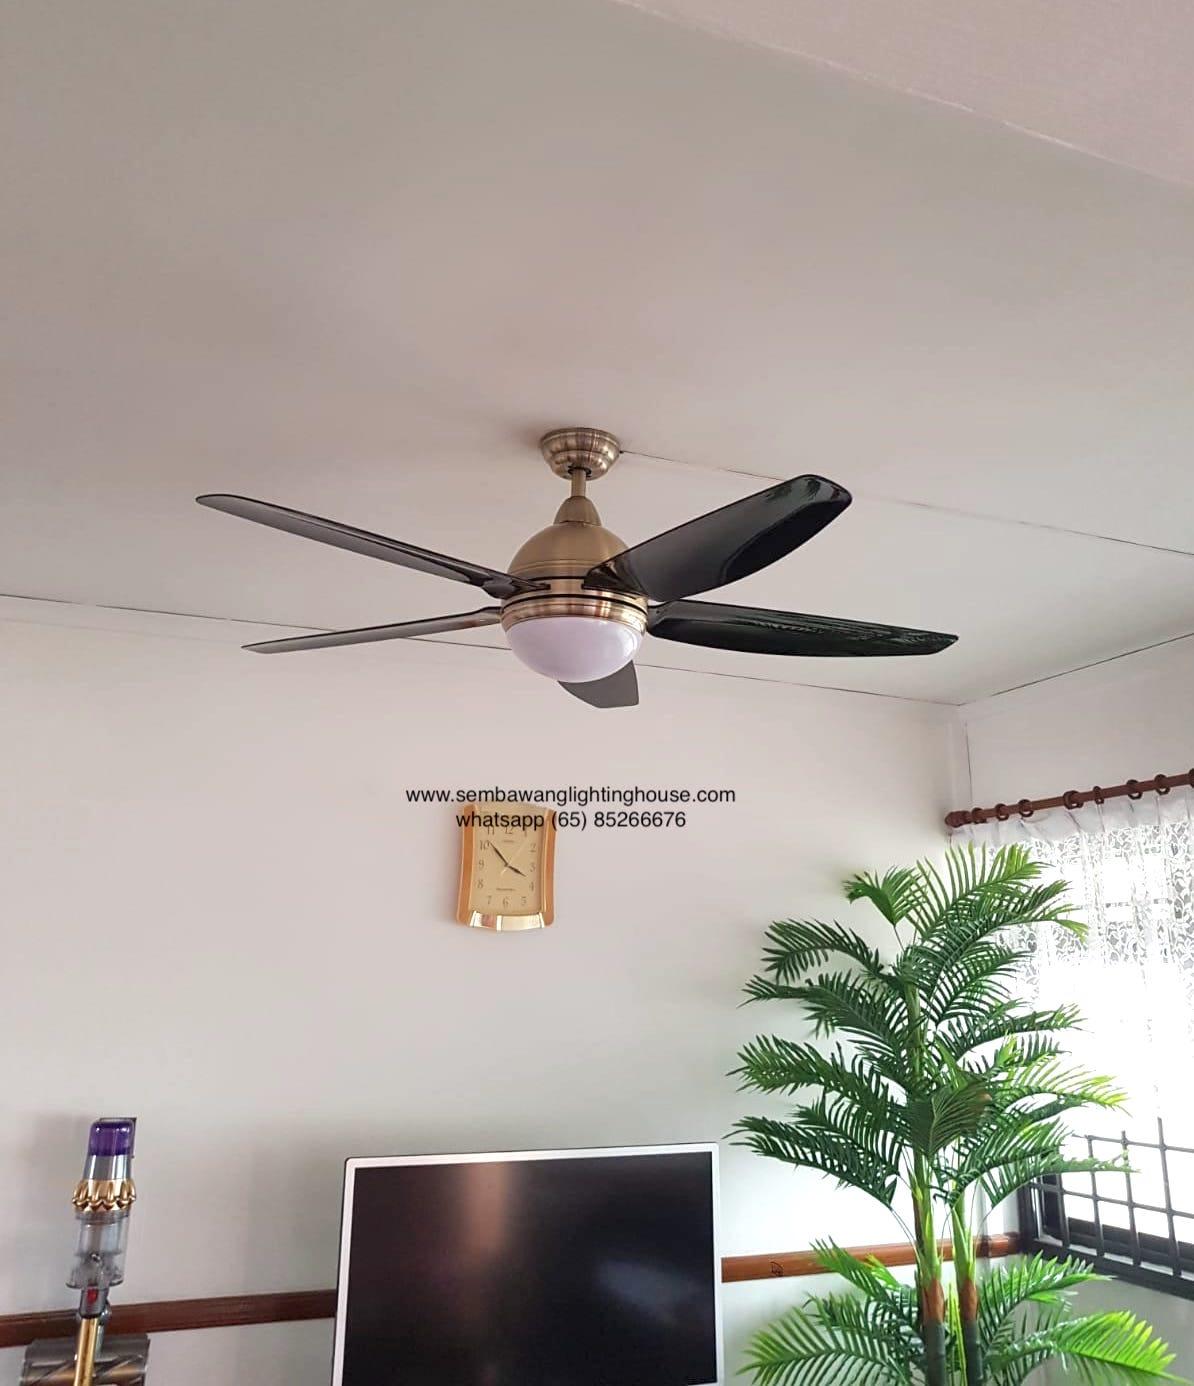 sample01-samaire-sa575-57-inch-brown-ceiling-fan-with-light-sembawang-lighting-house.jpg